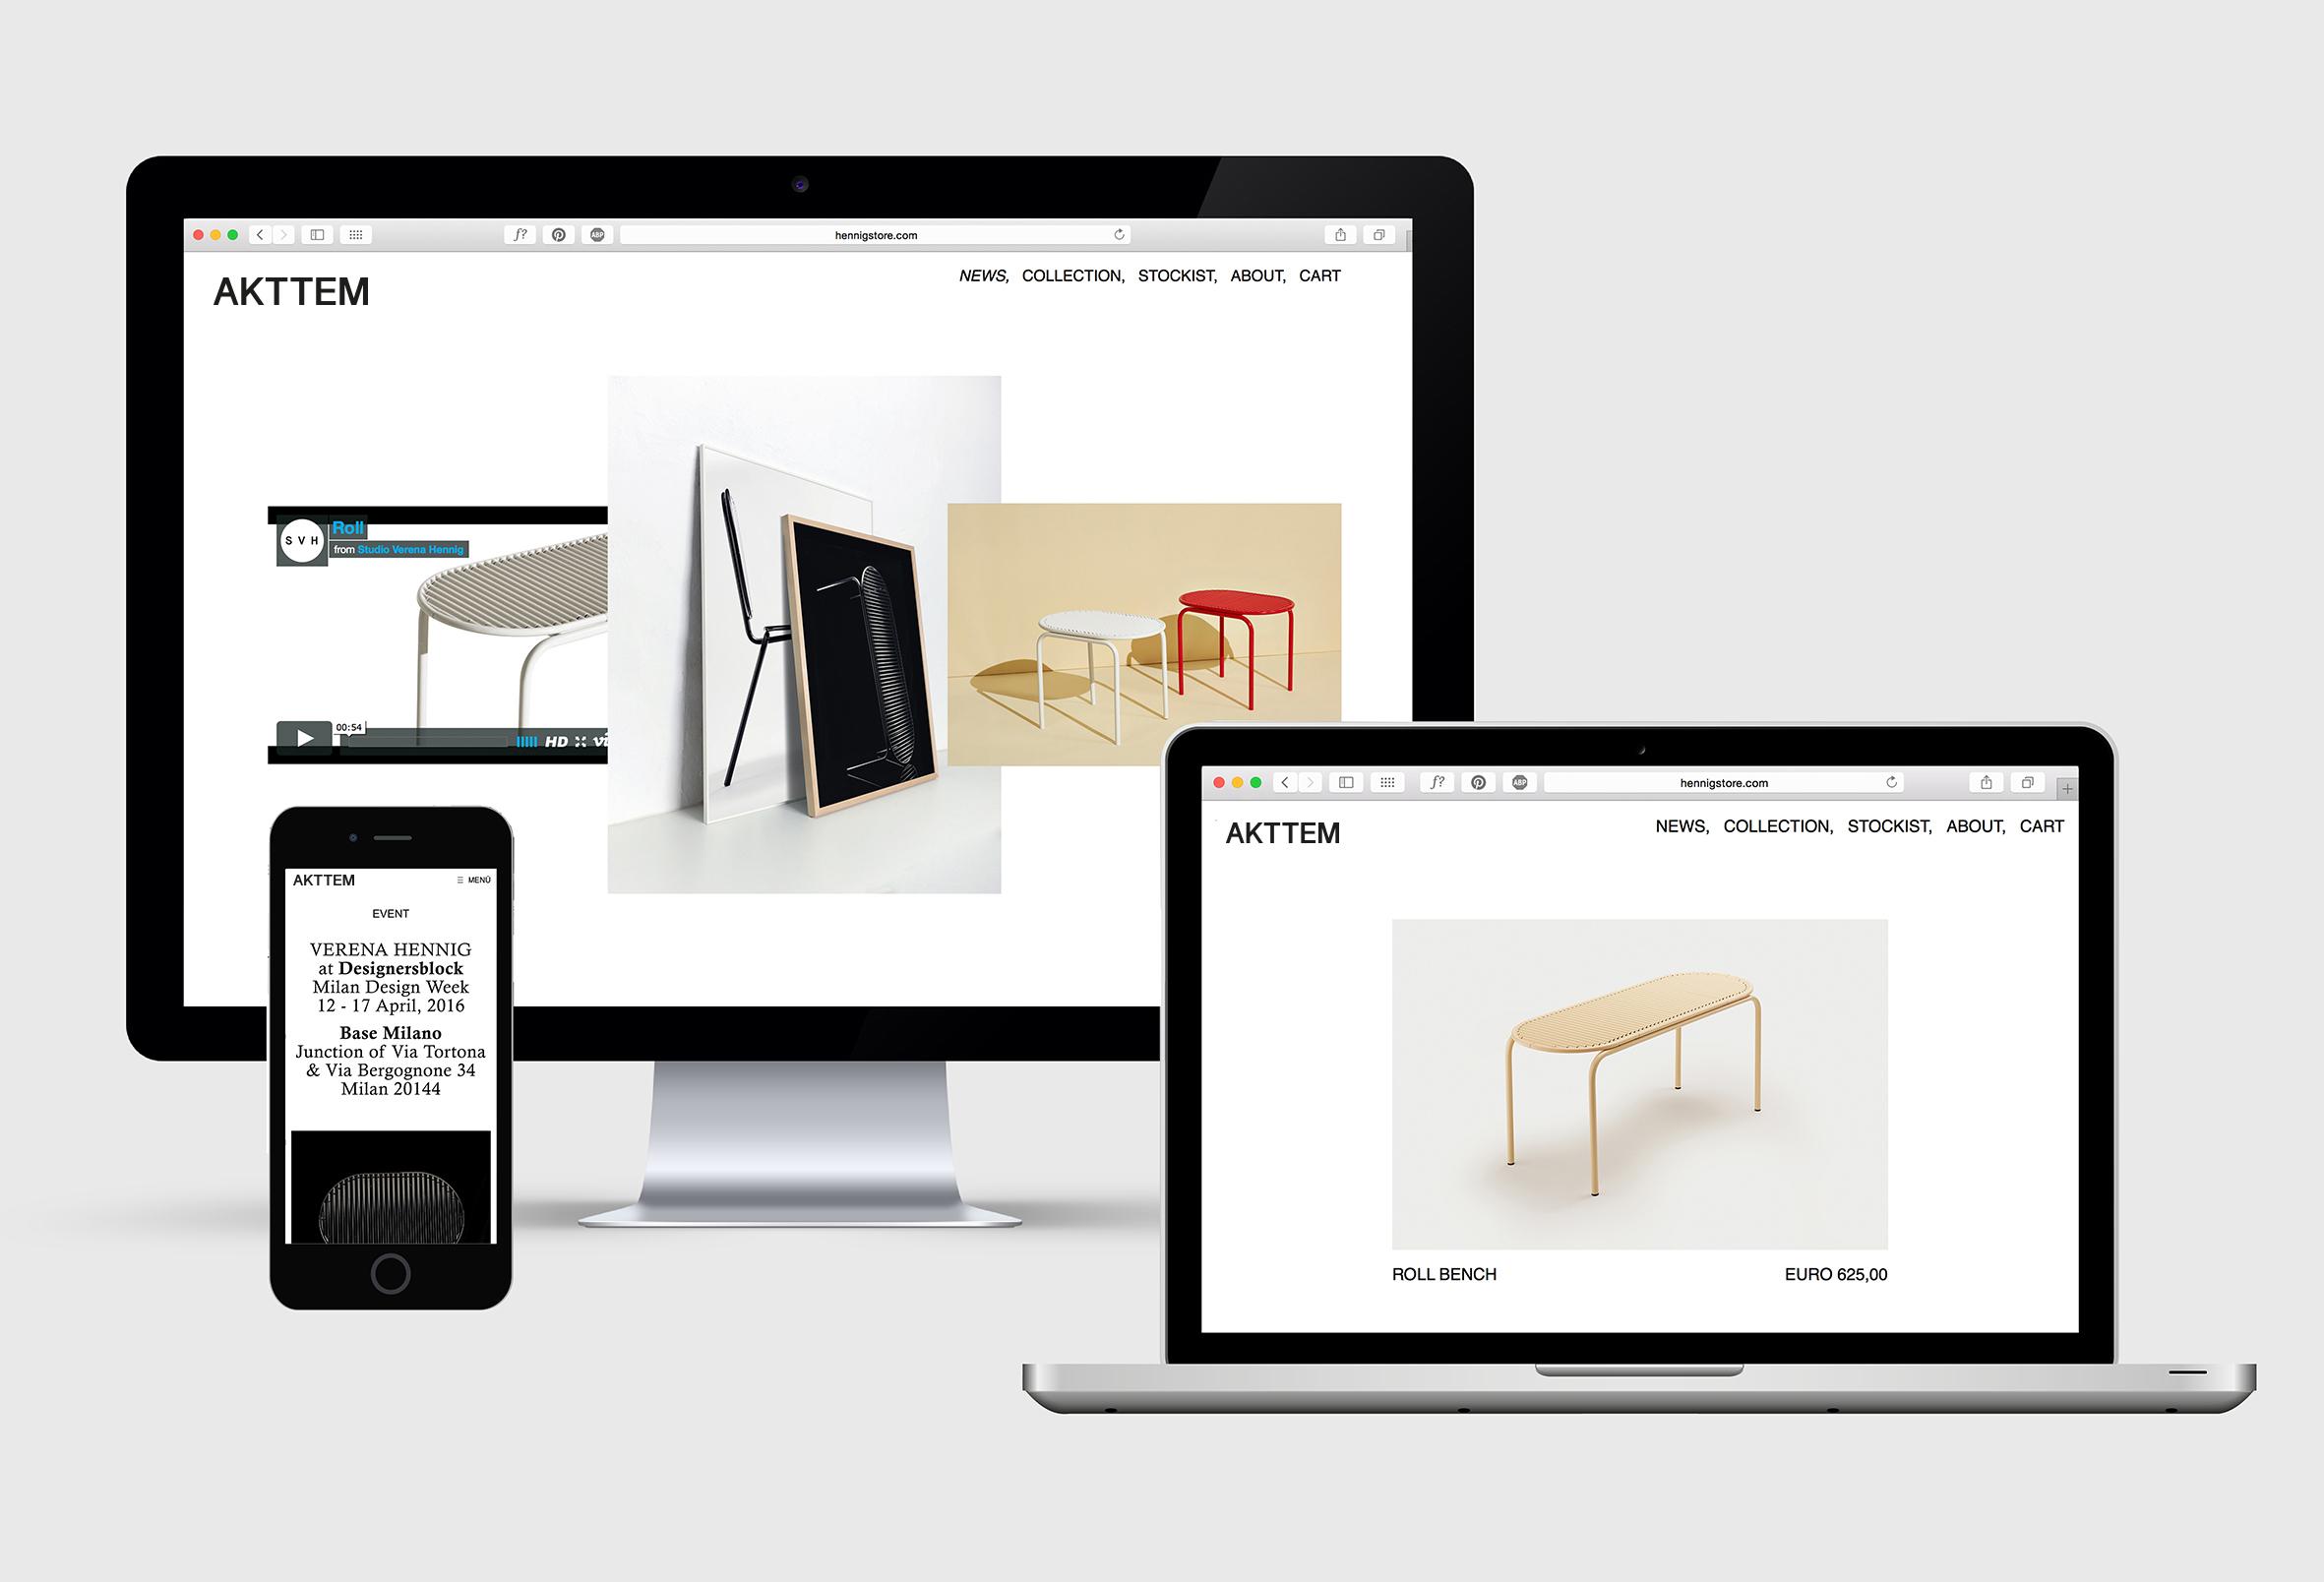 Studio-Verena-Hennig-AKTTEM-Website.jpg